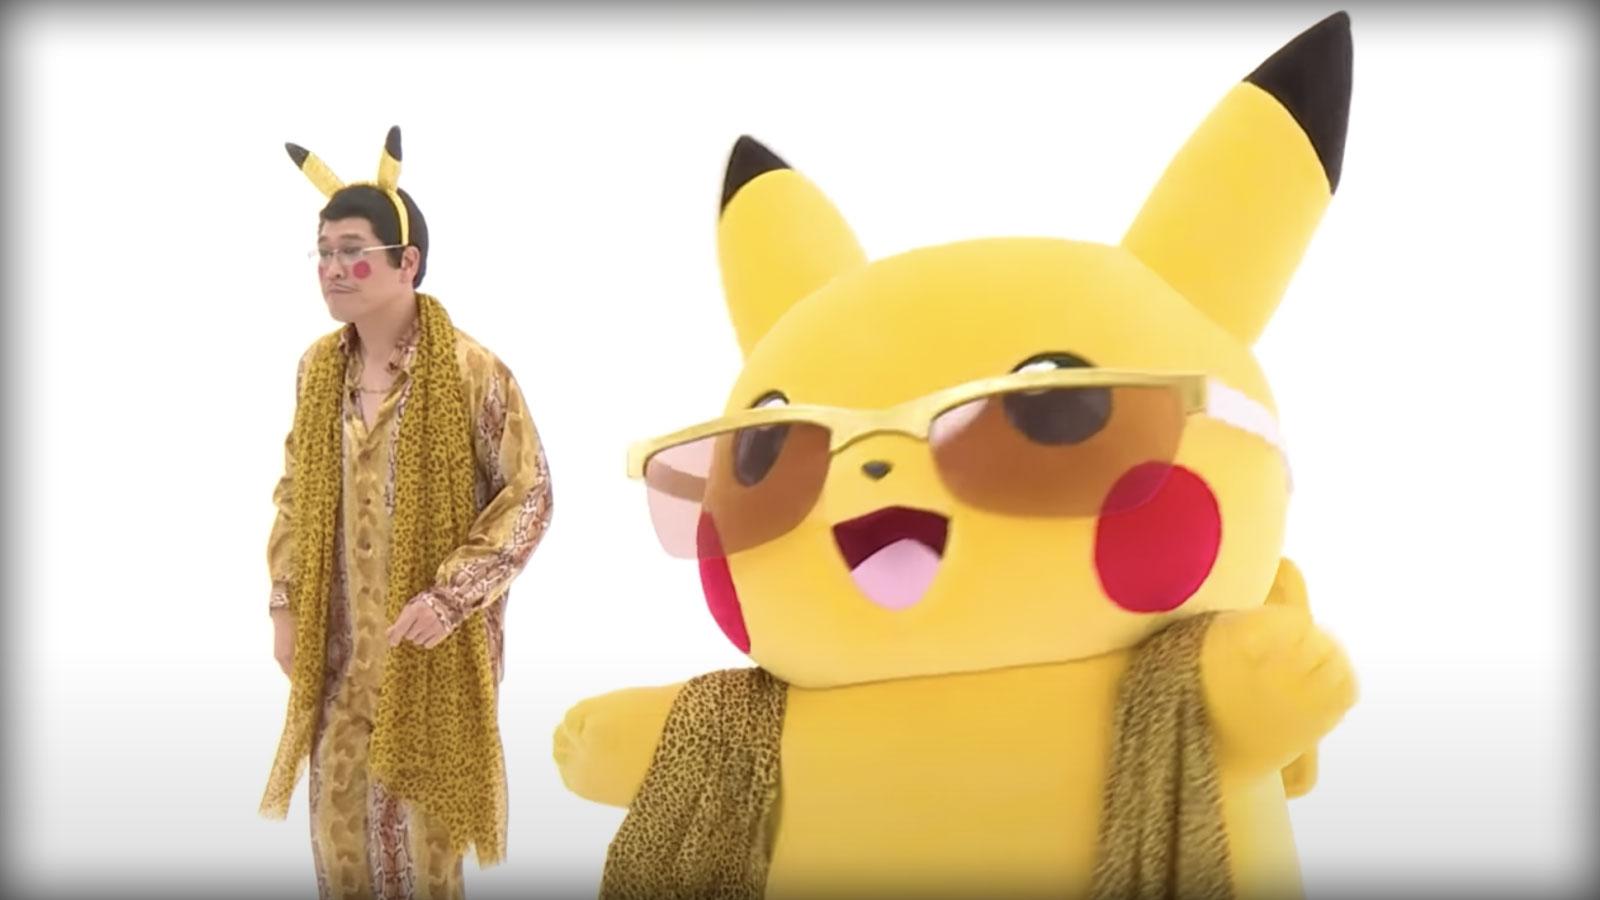 pineapple pen guy pikachu pokemon